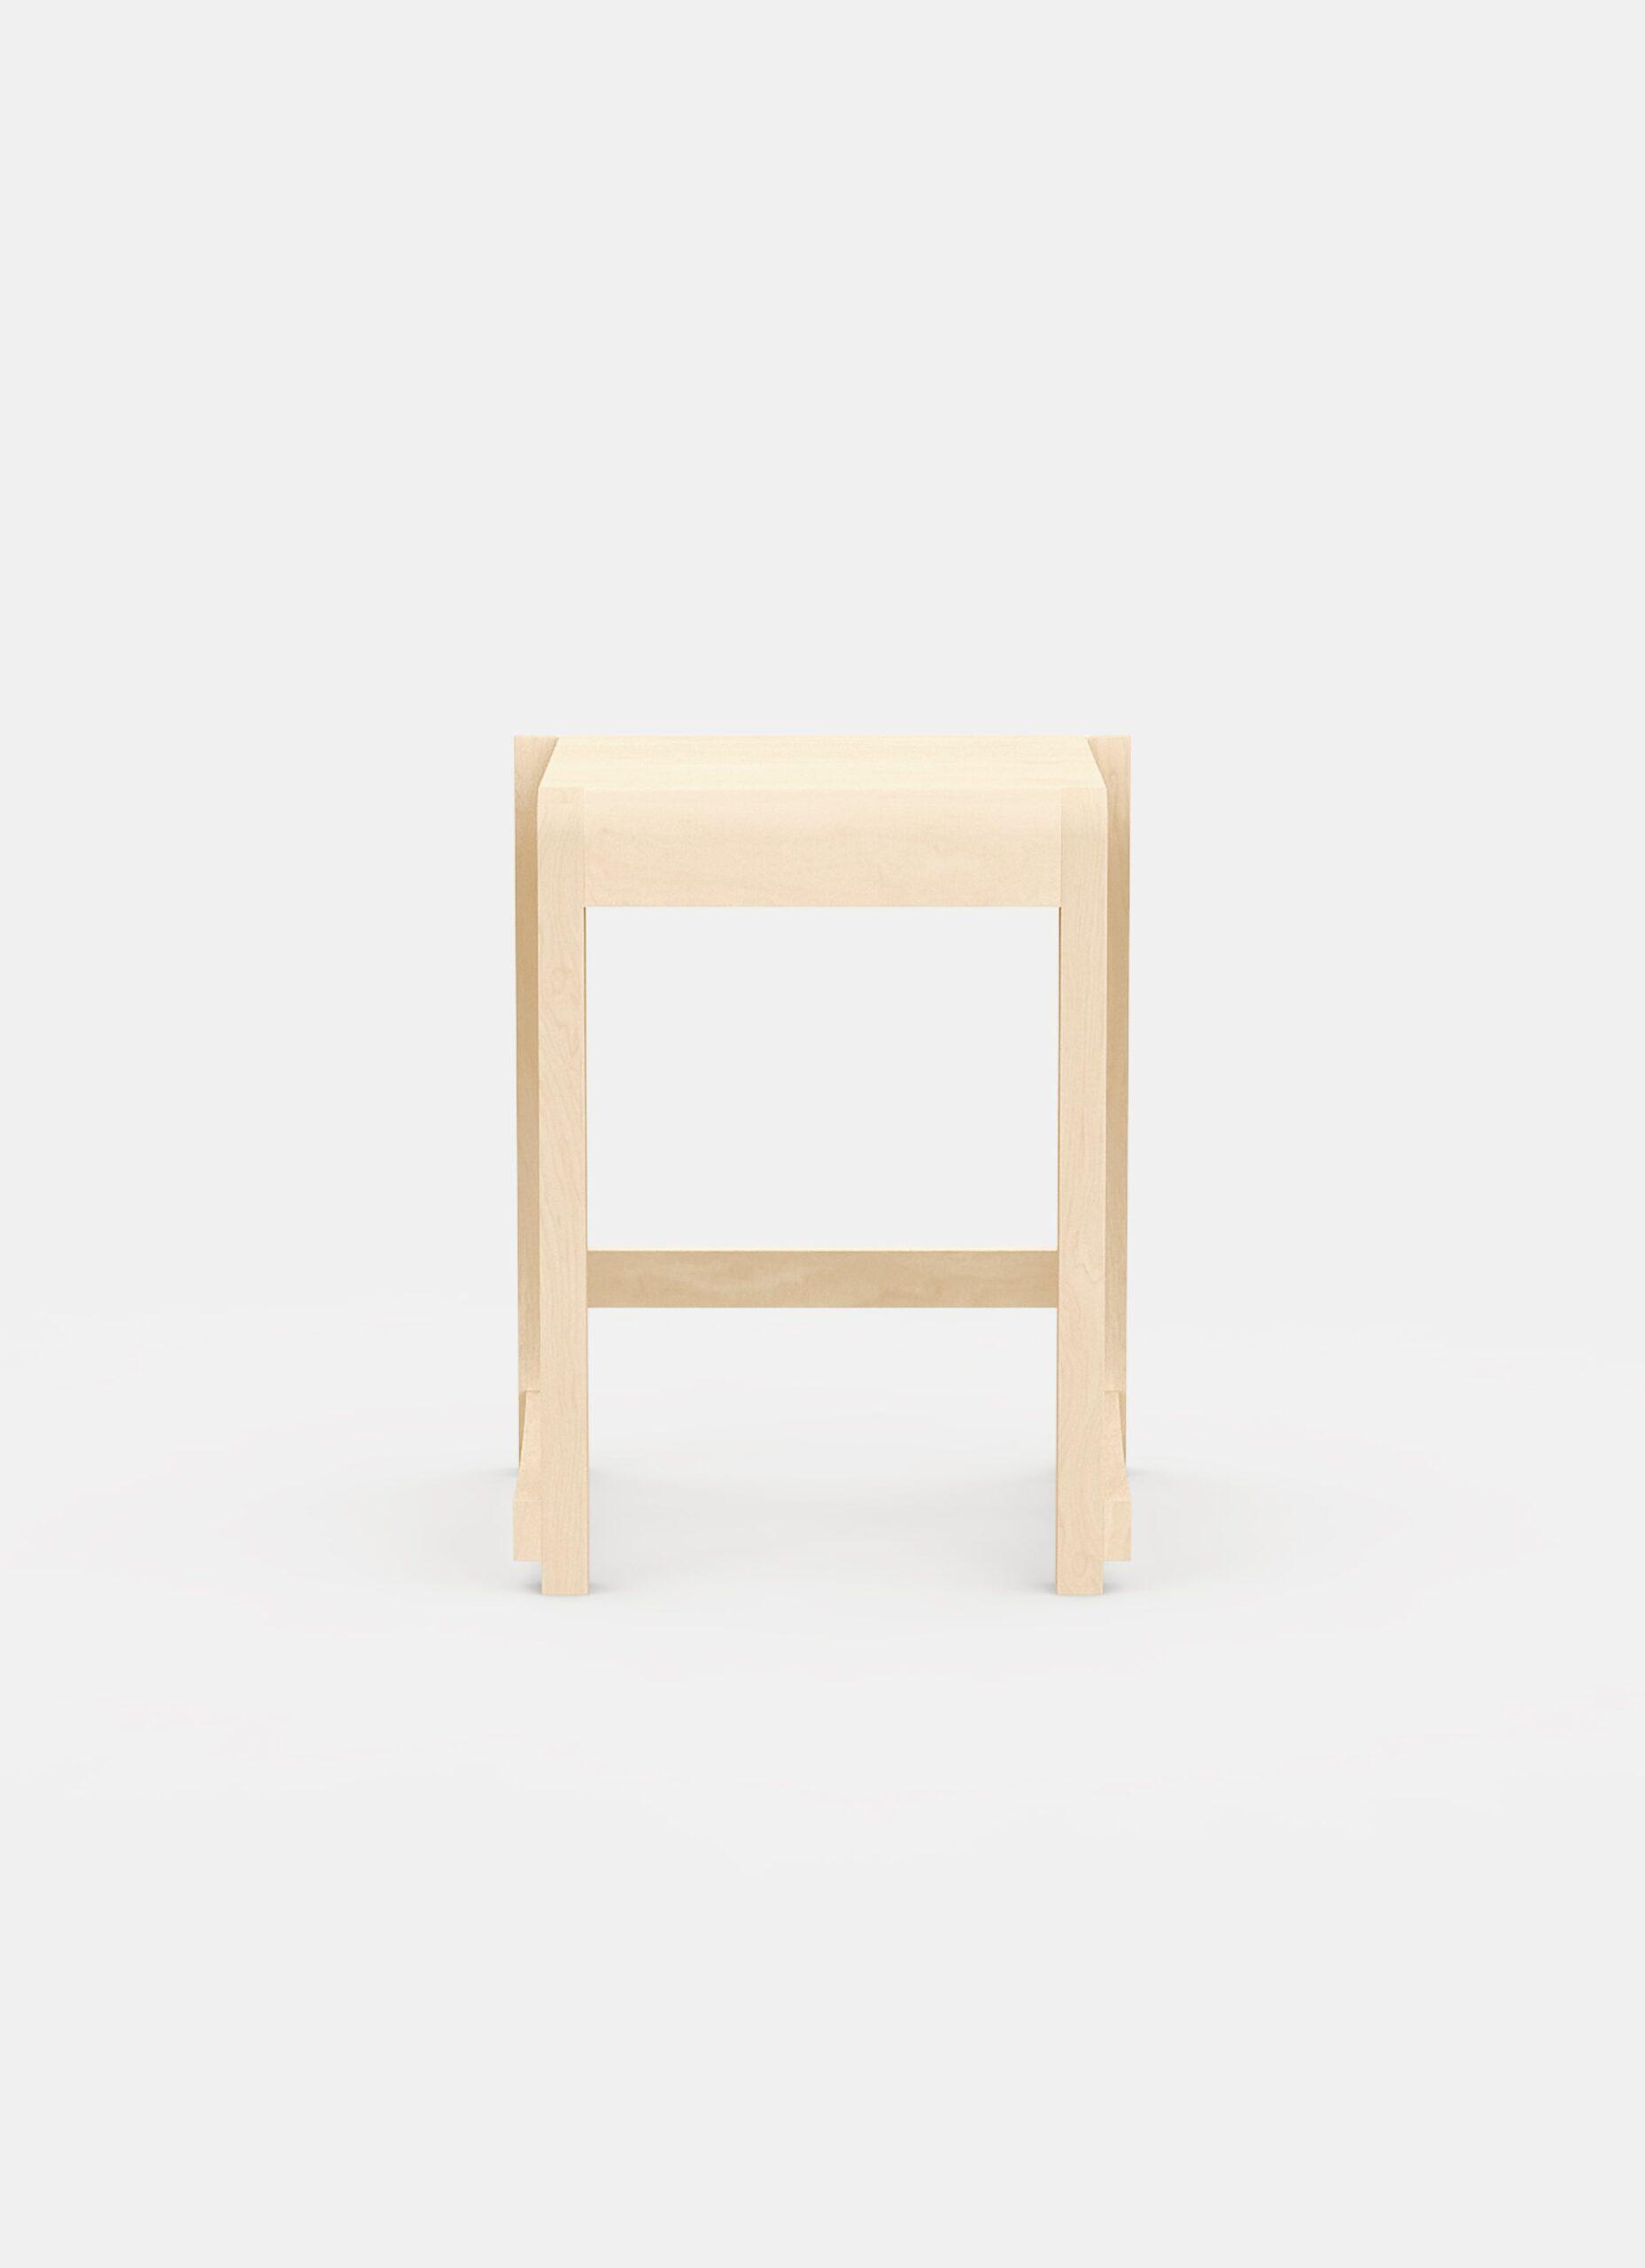 Frama - Low Stool 01 - Natural Wood